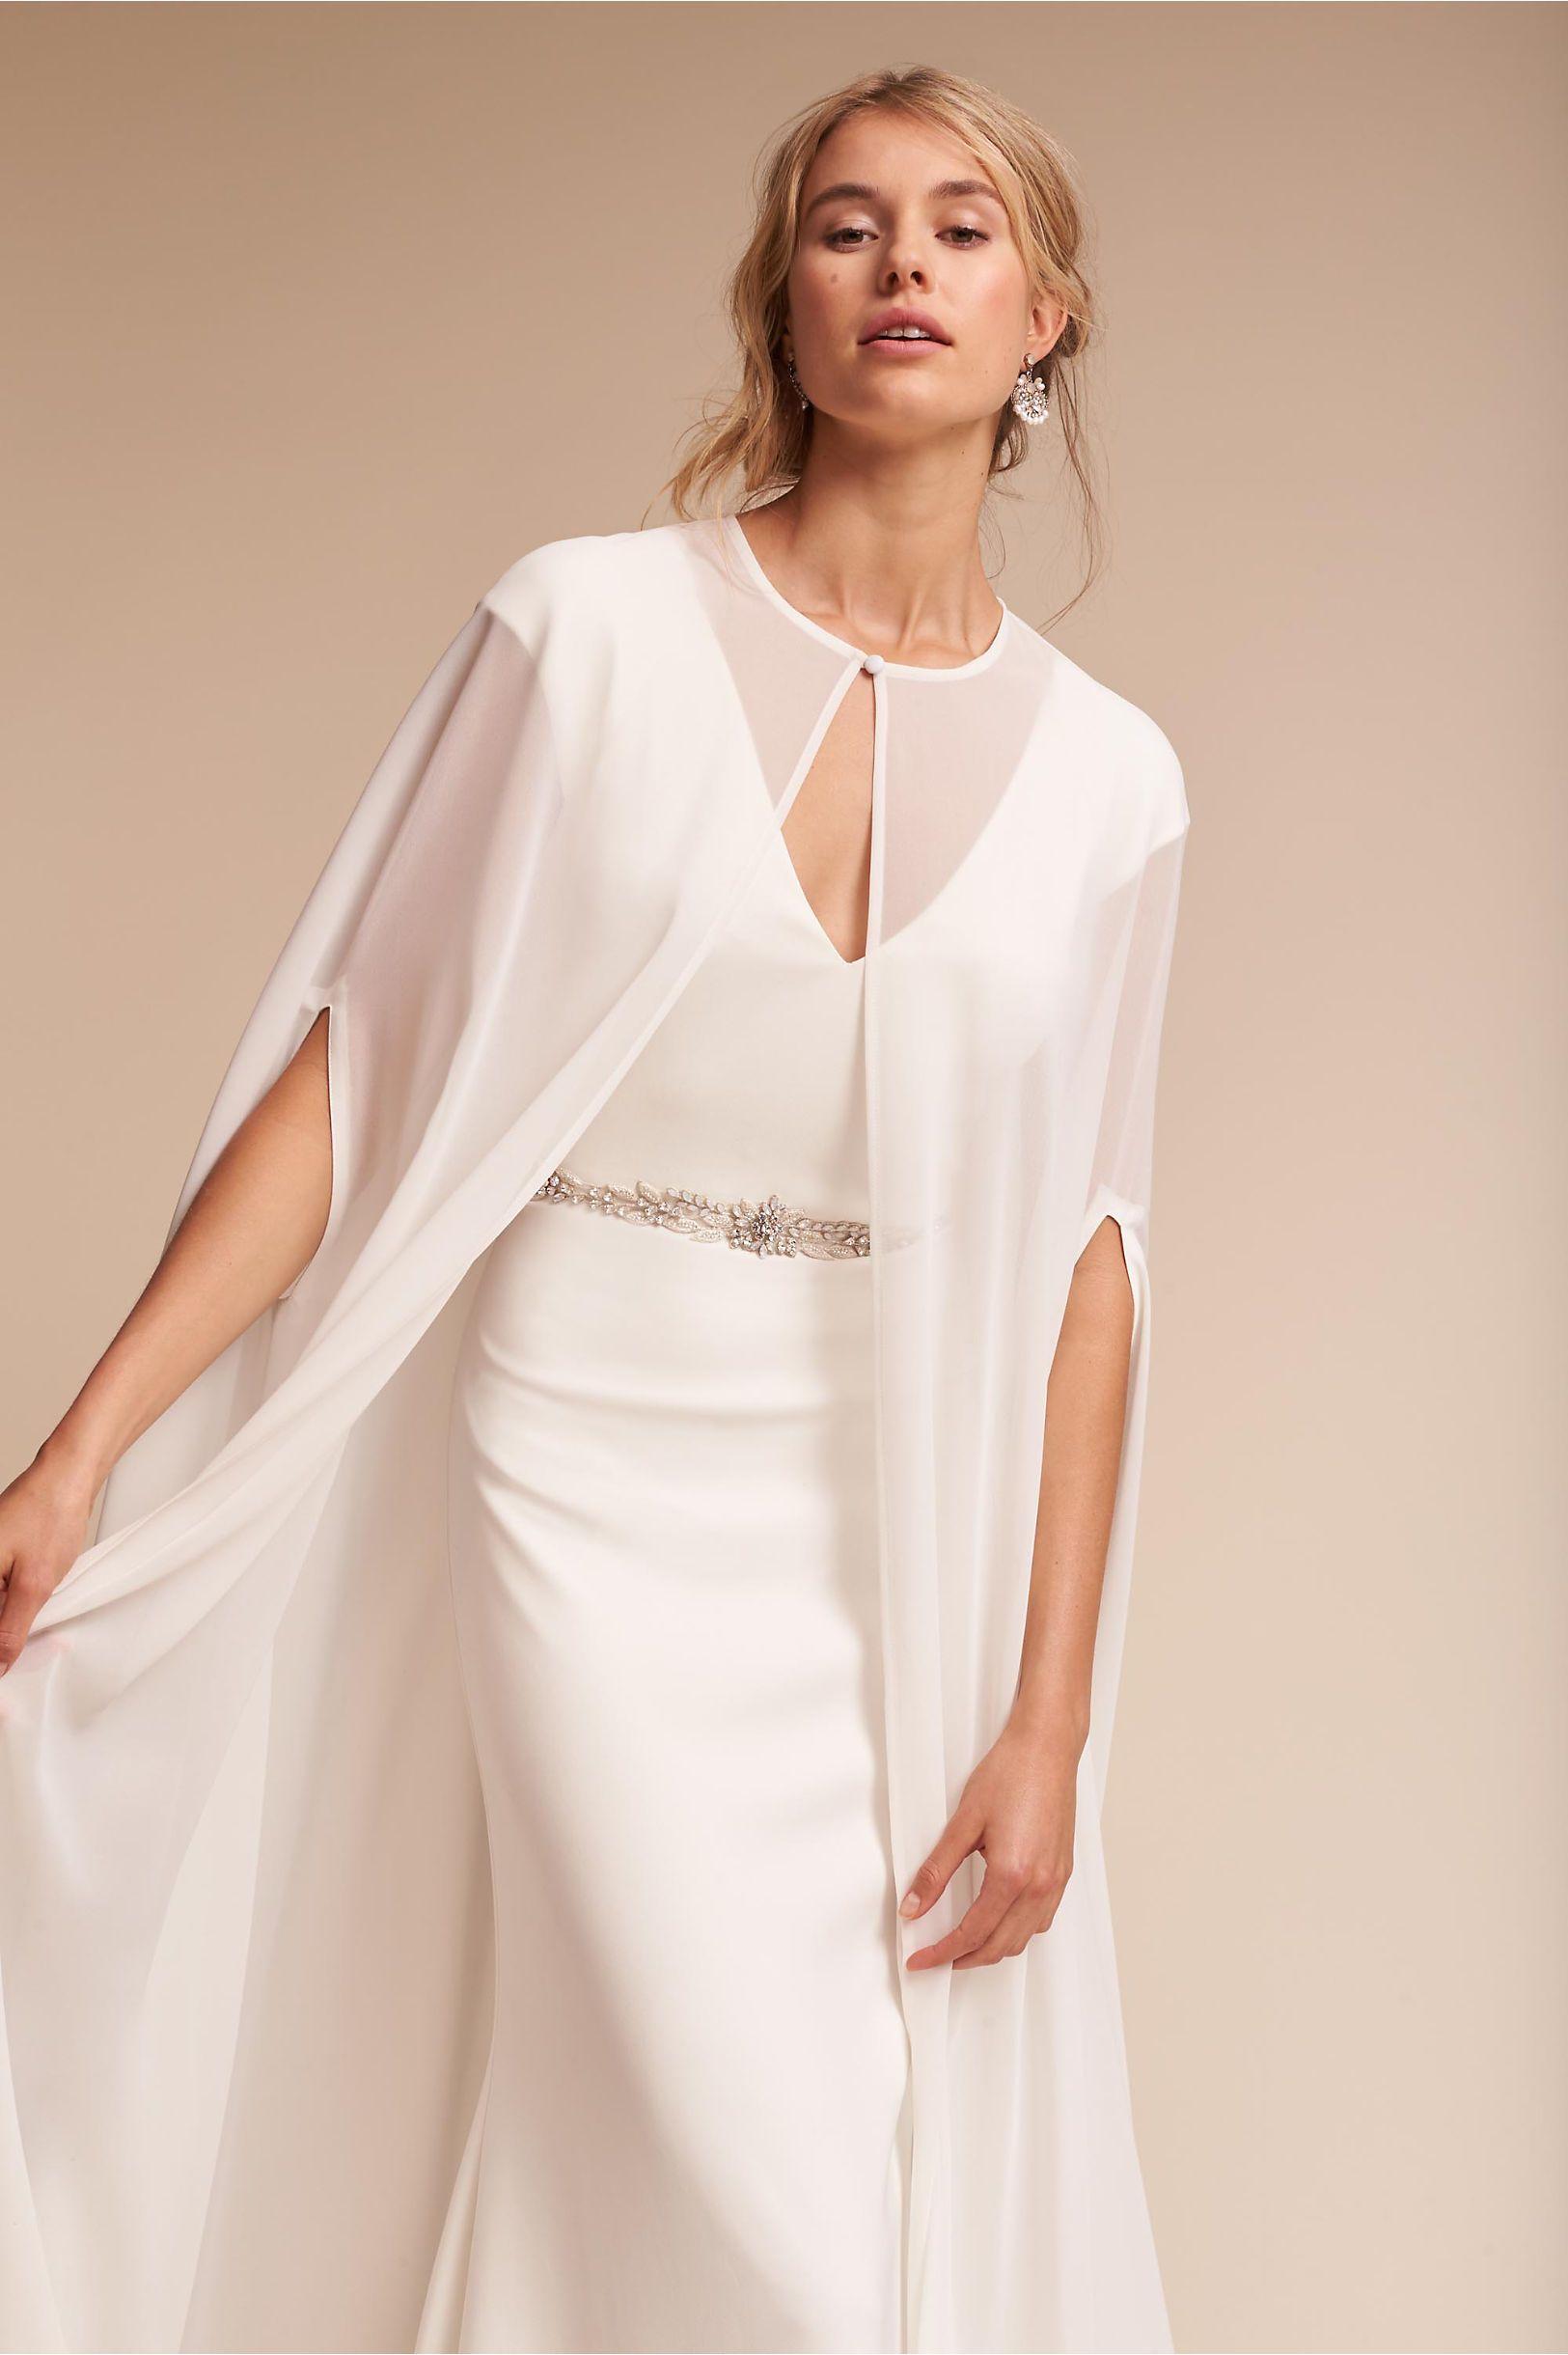 Dorrit cape in wedding ideas pinterest wedding dresses